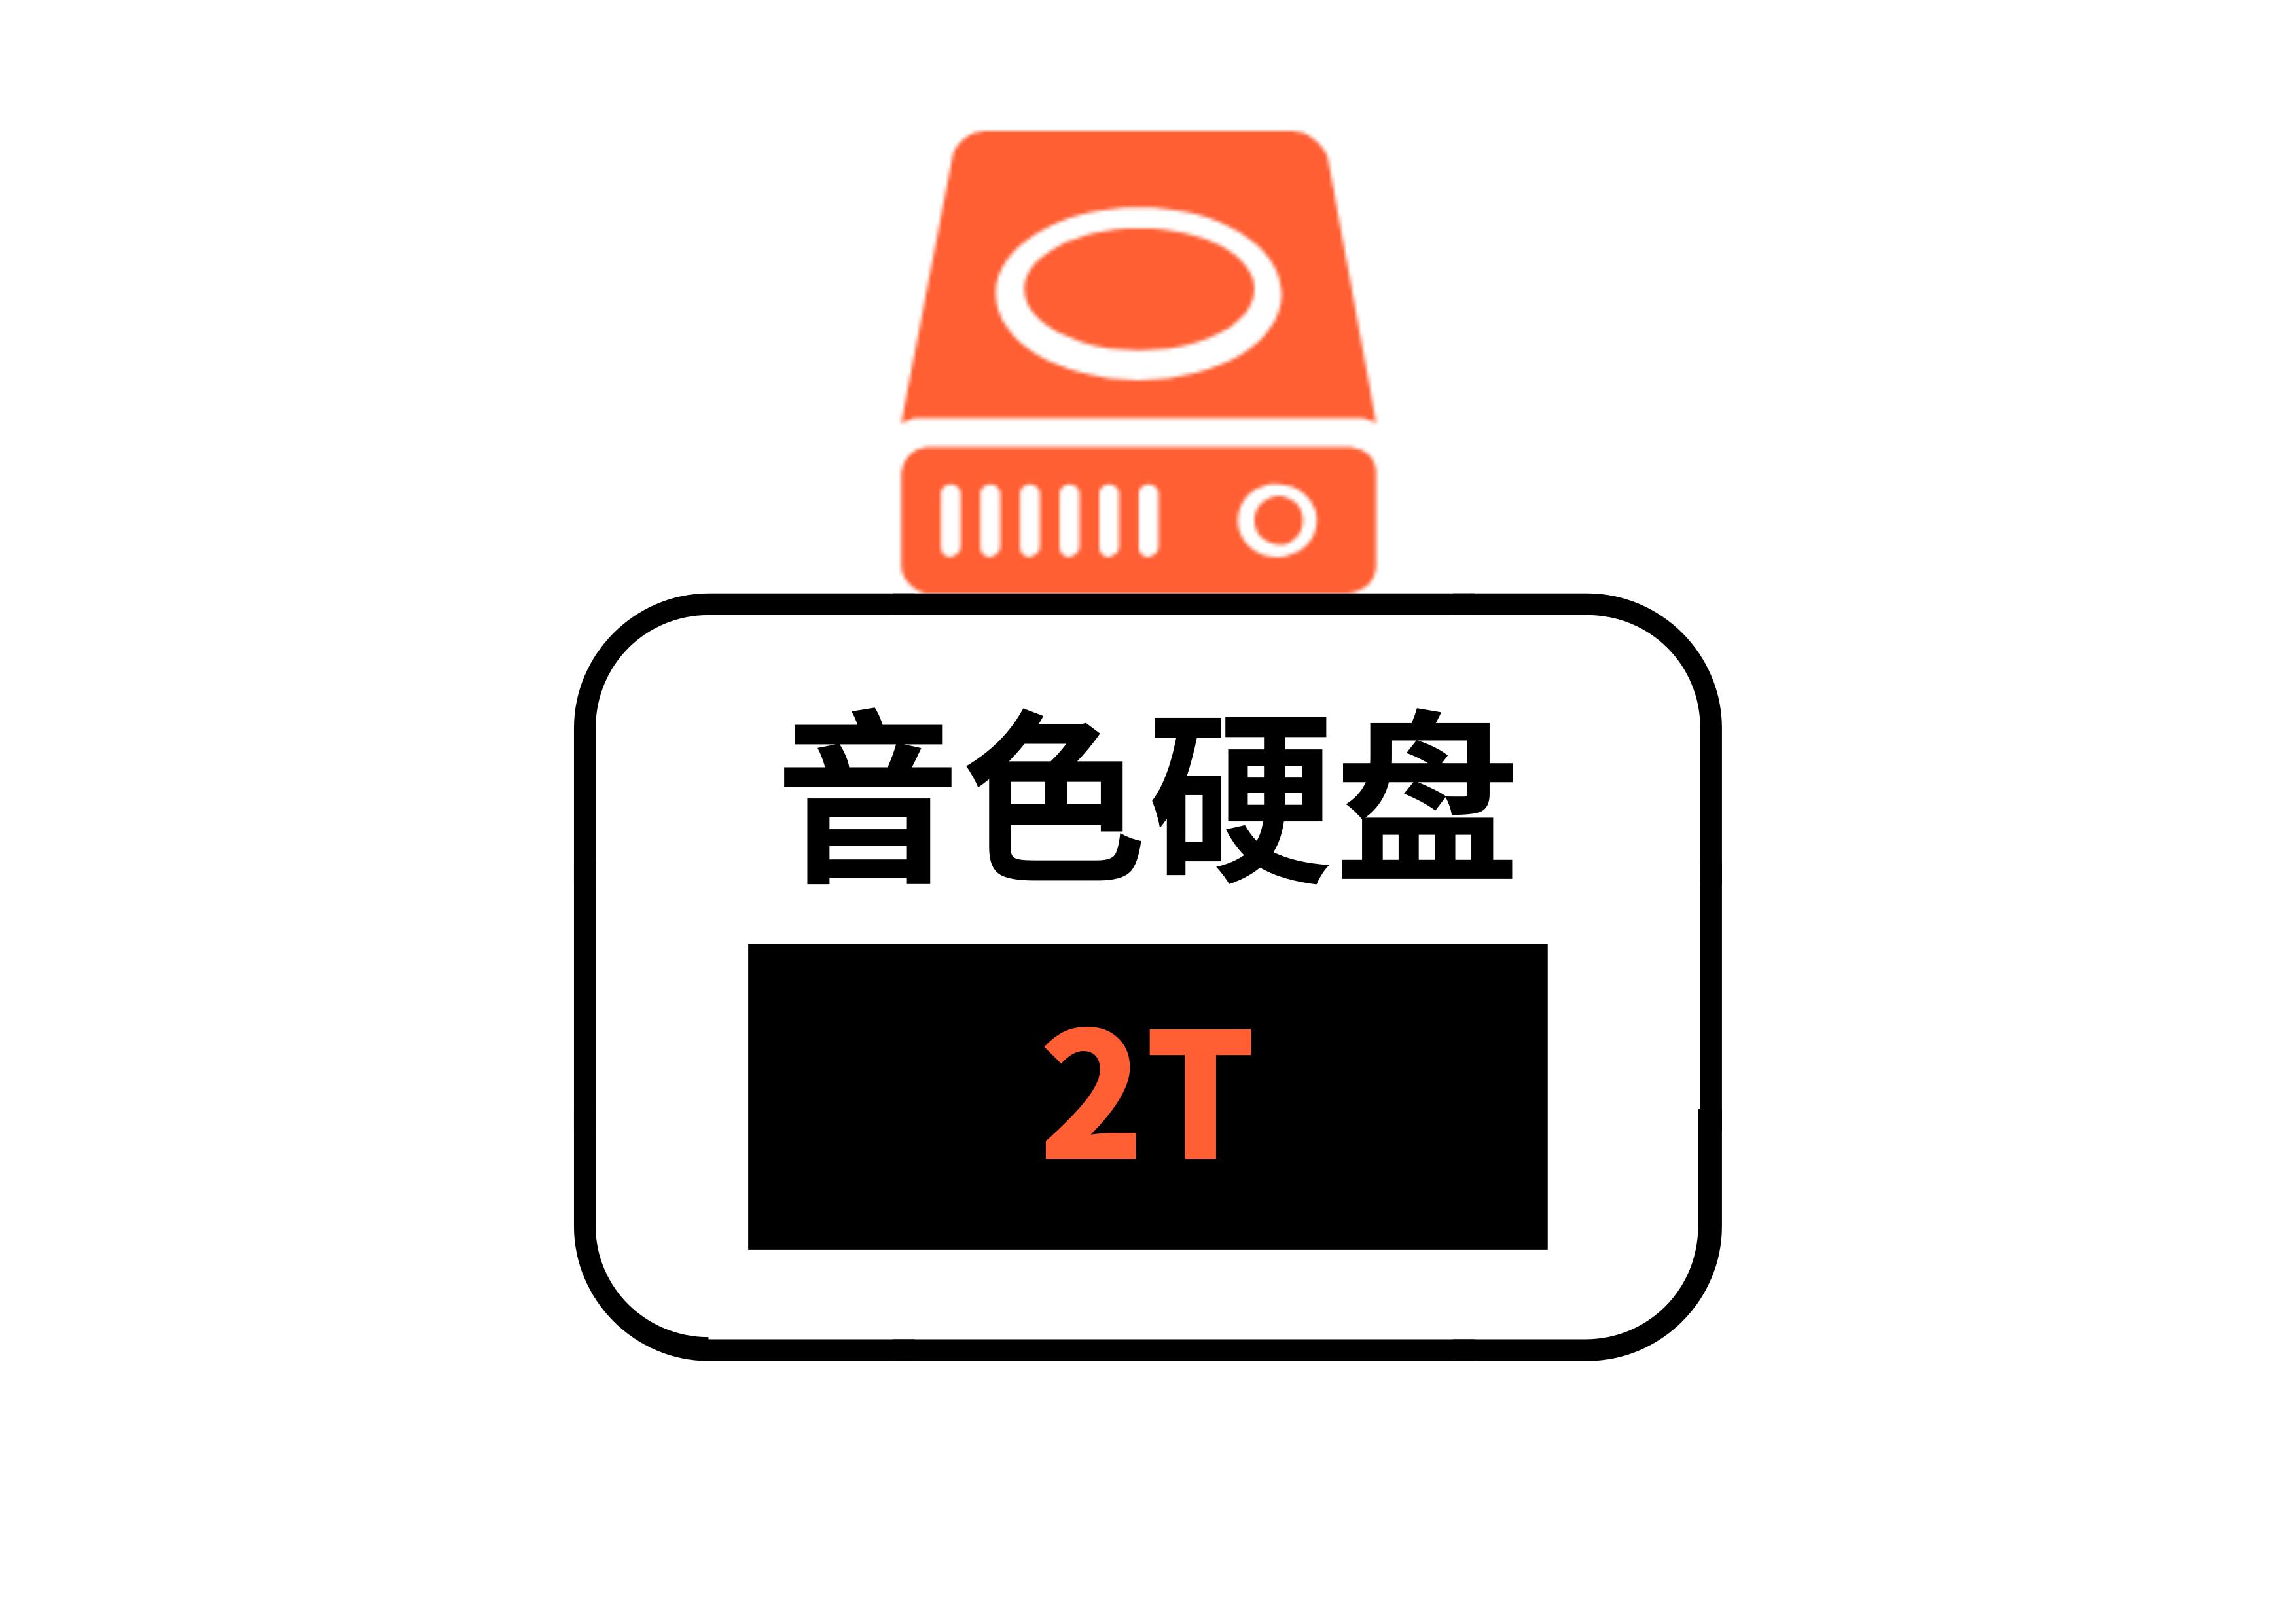 2T(2000G) 移动硬盘音色